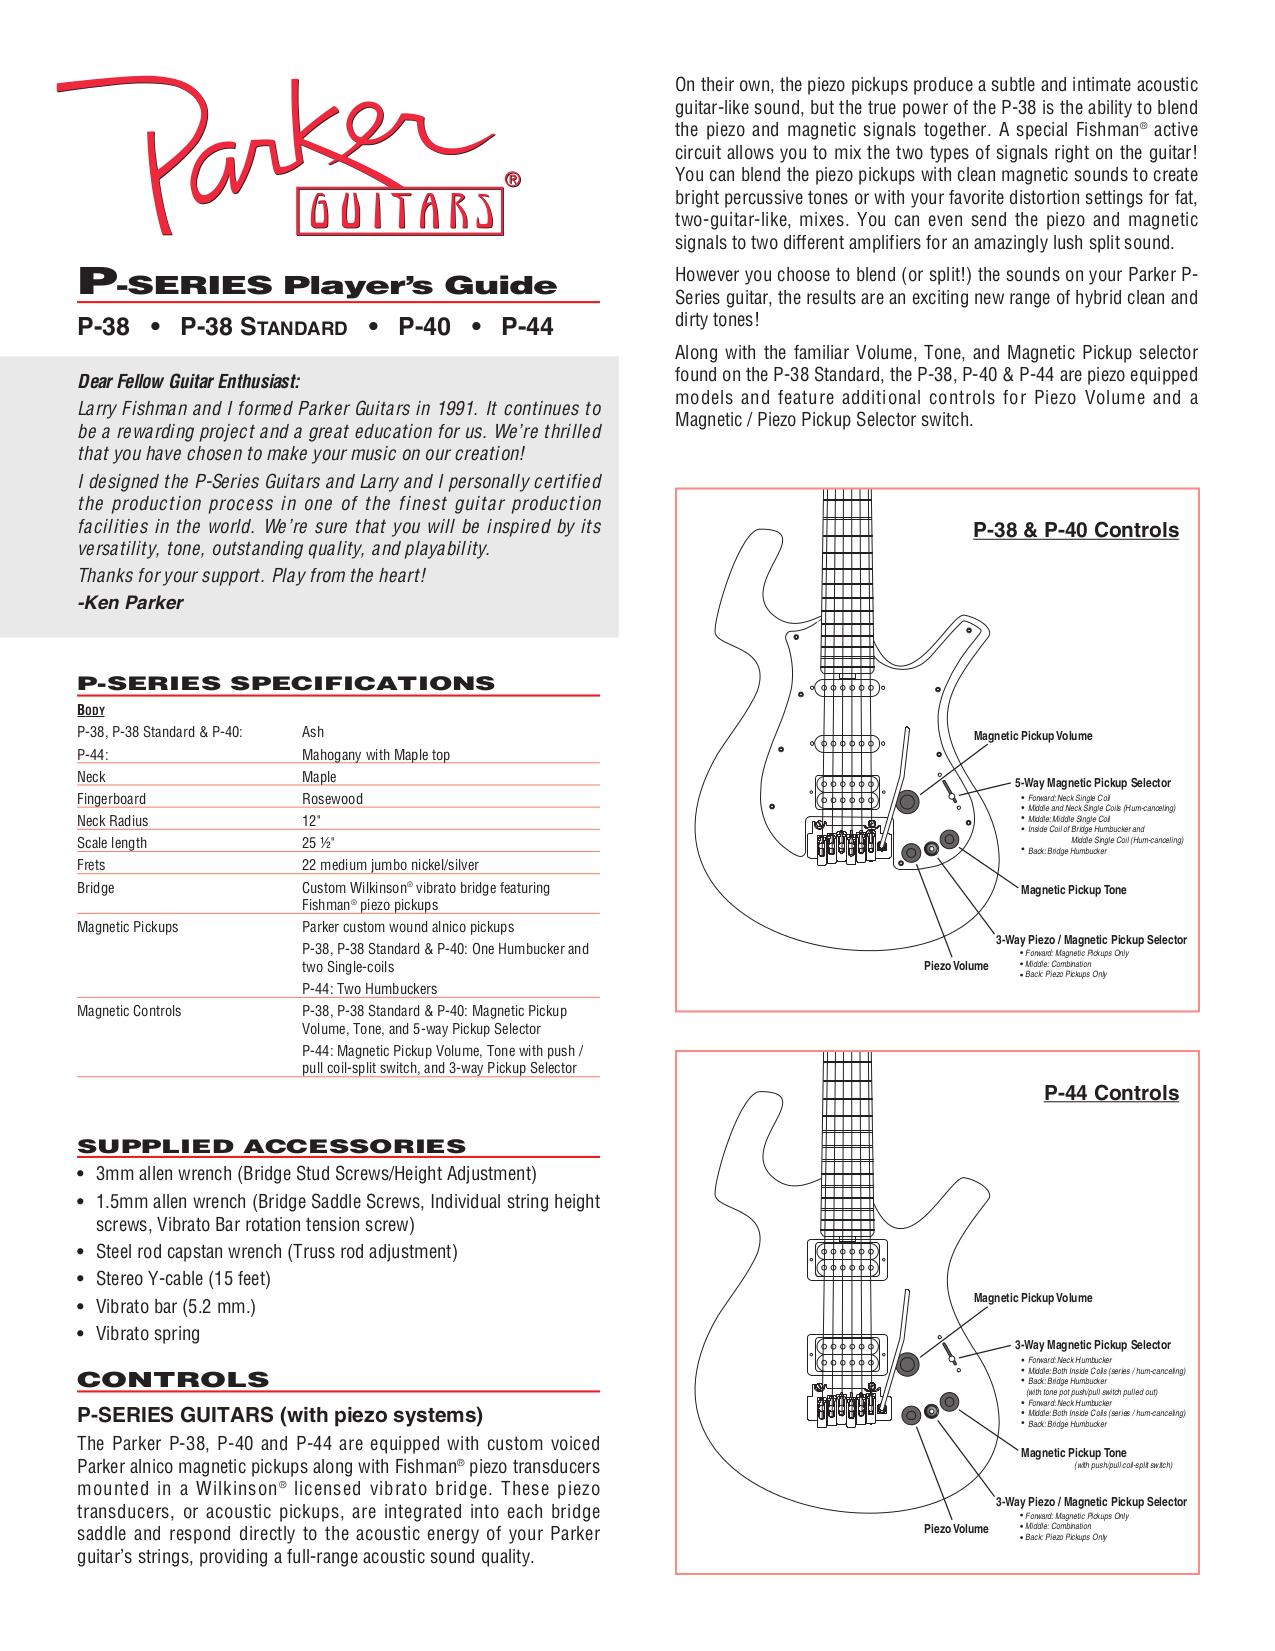 movement abc 2 manual pdf